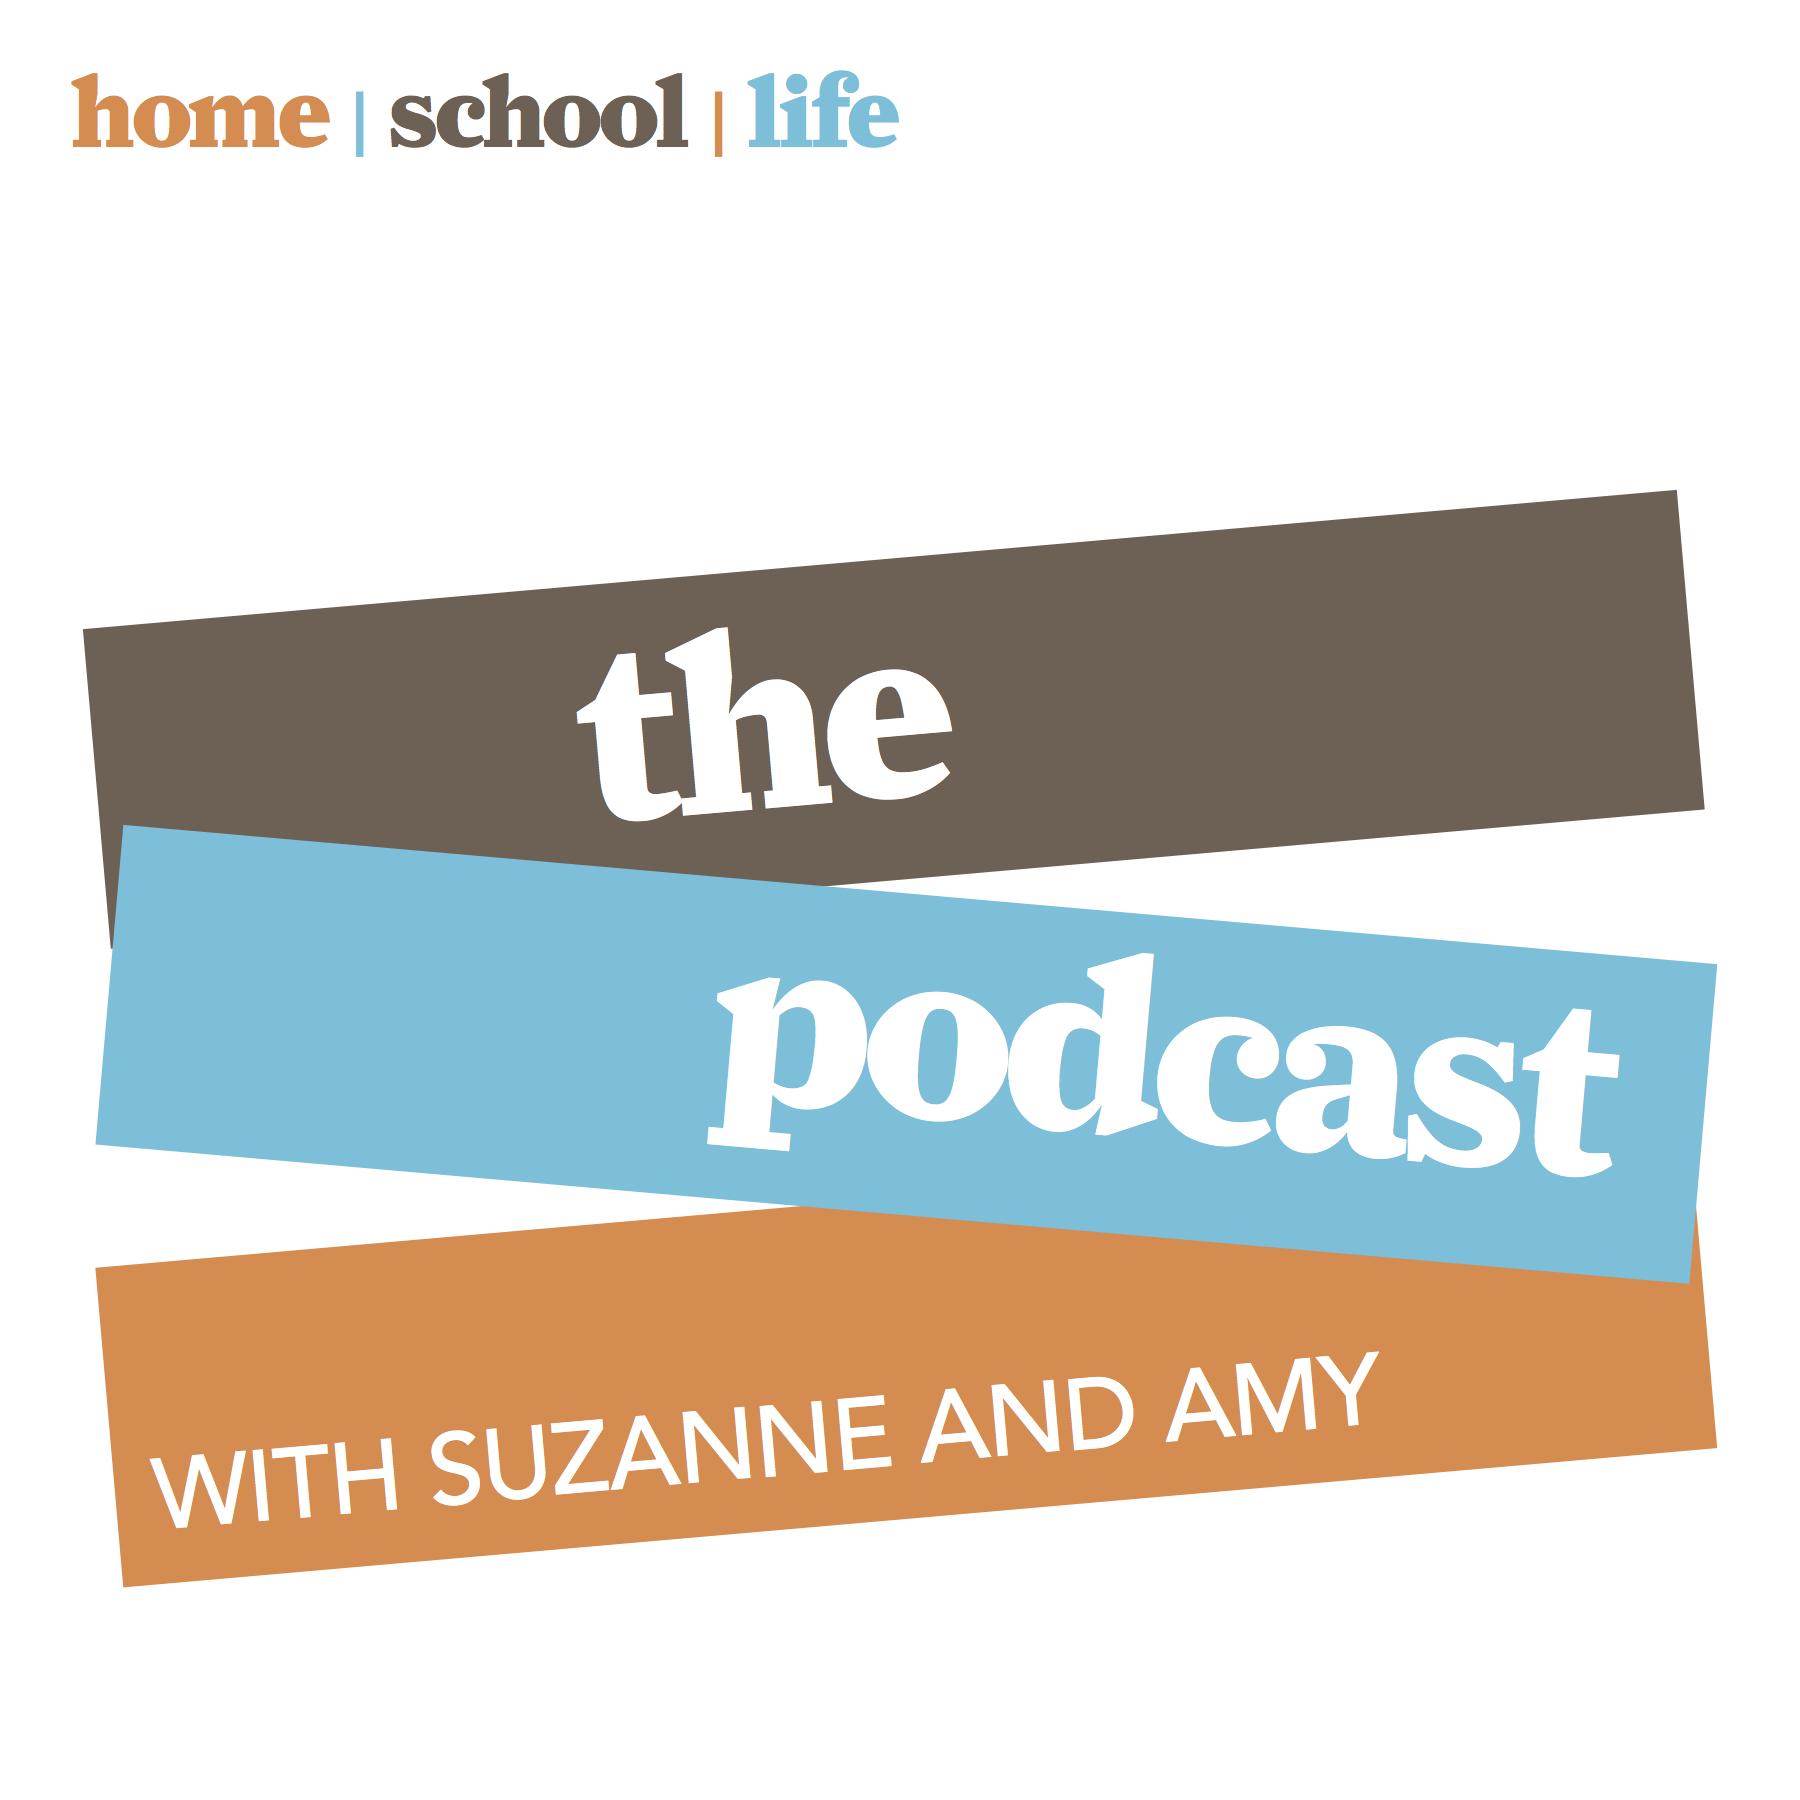 home/school/life's secular homeschool podcast: episode 3